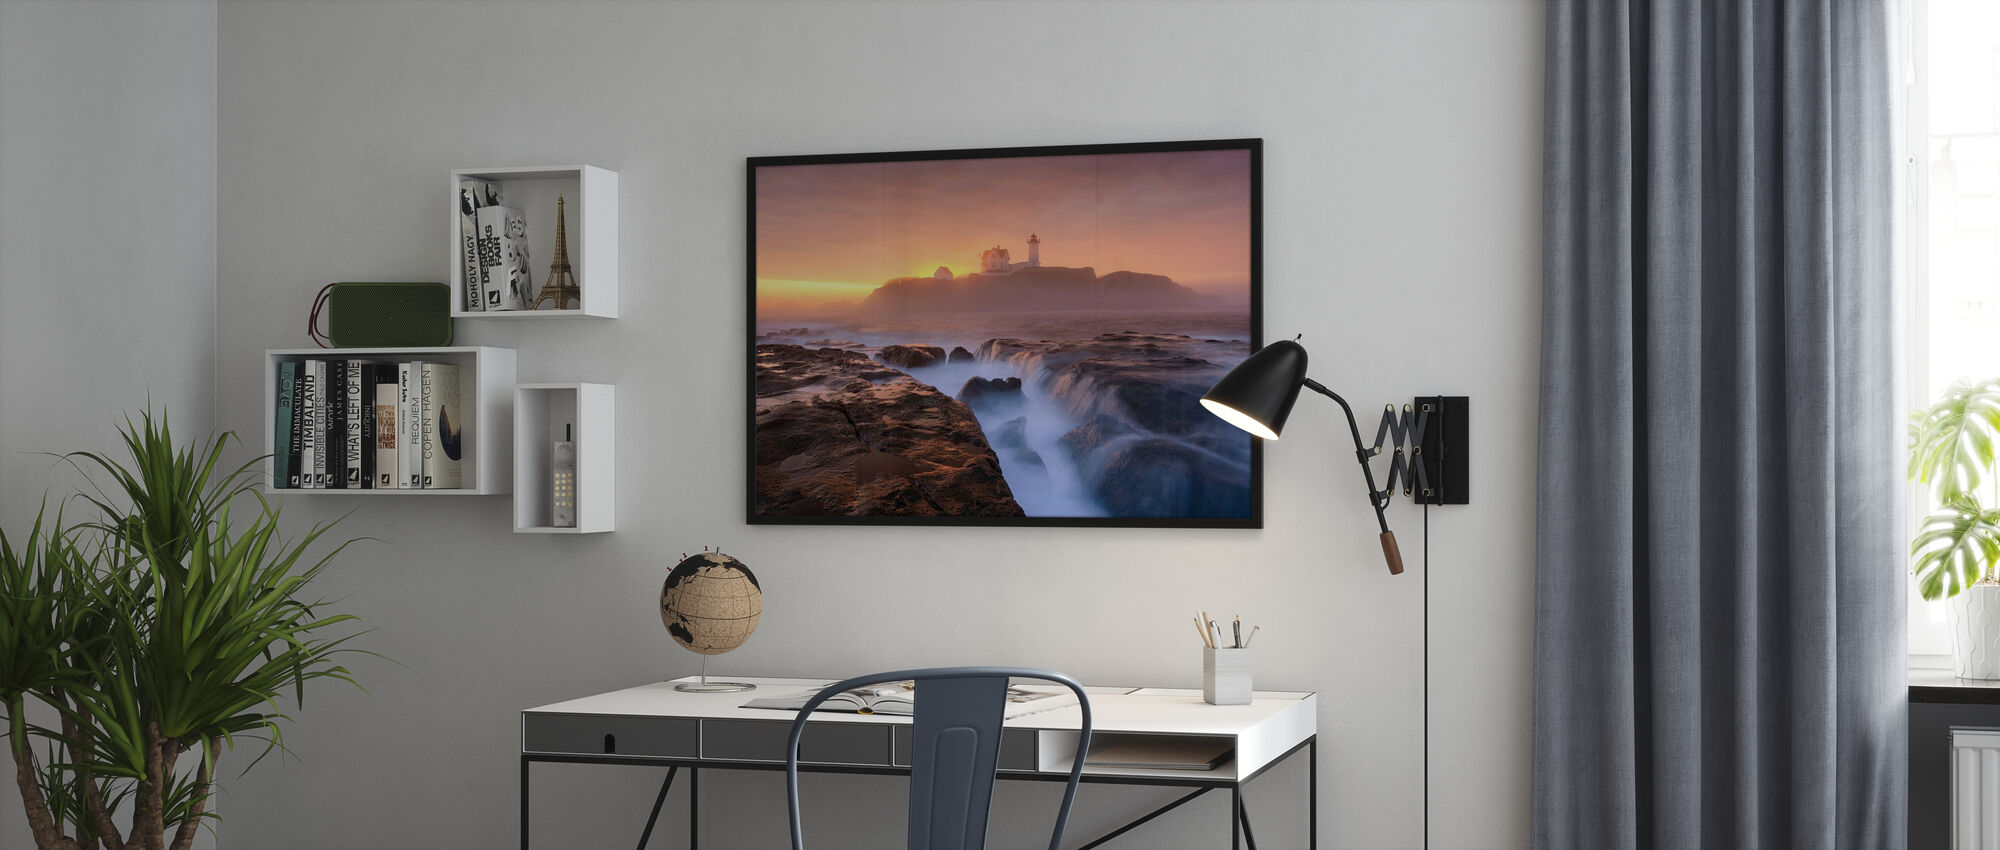 Dimma över tidvattnet - Poster - Kontor